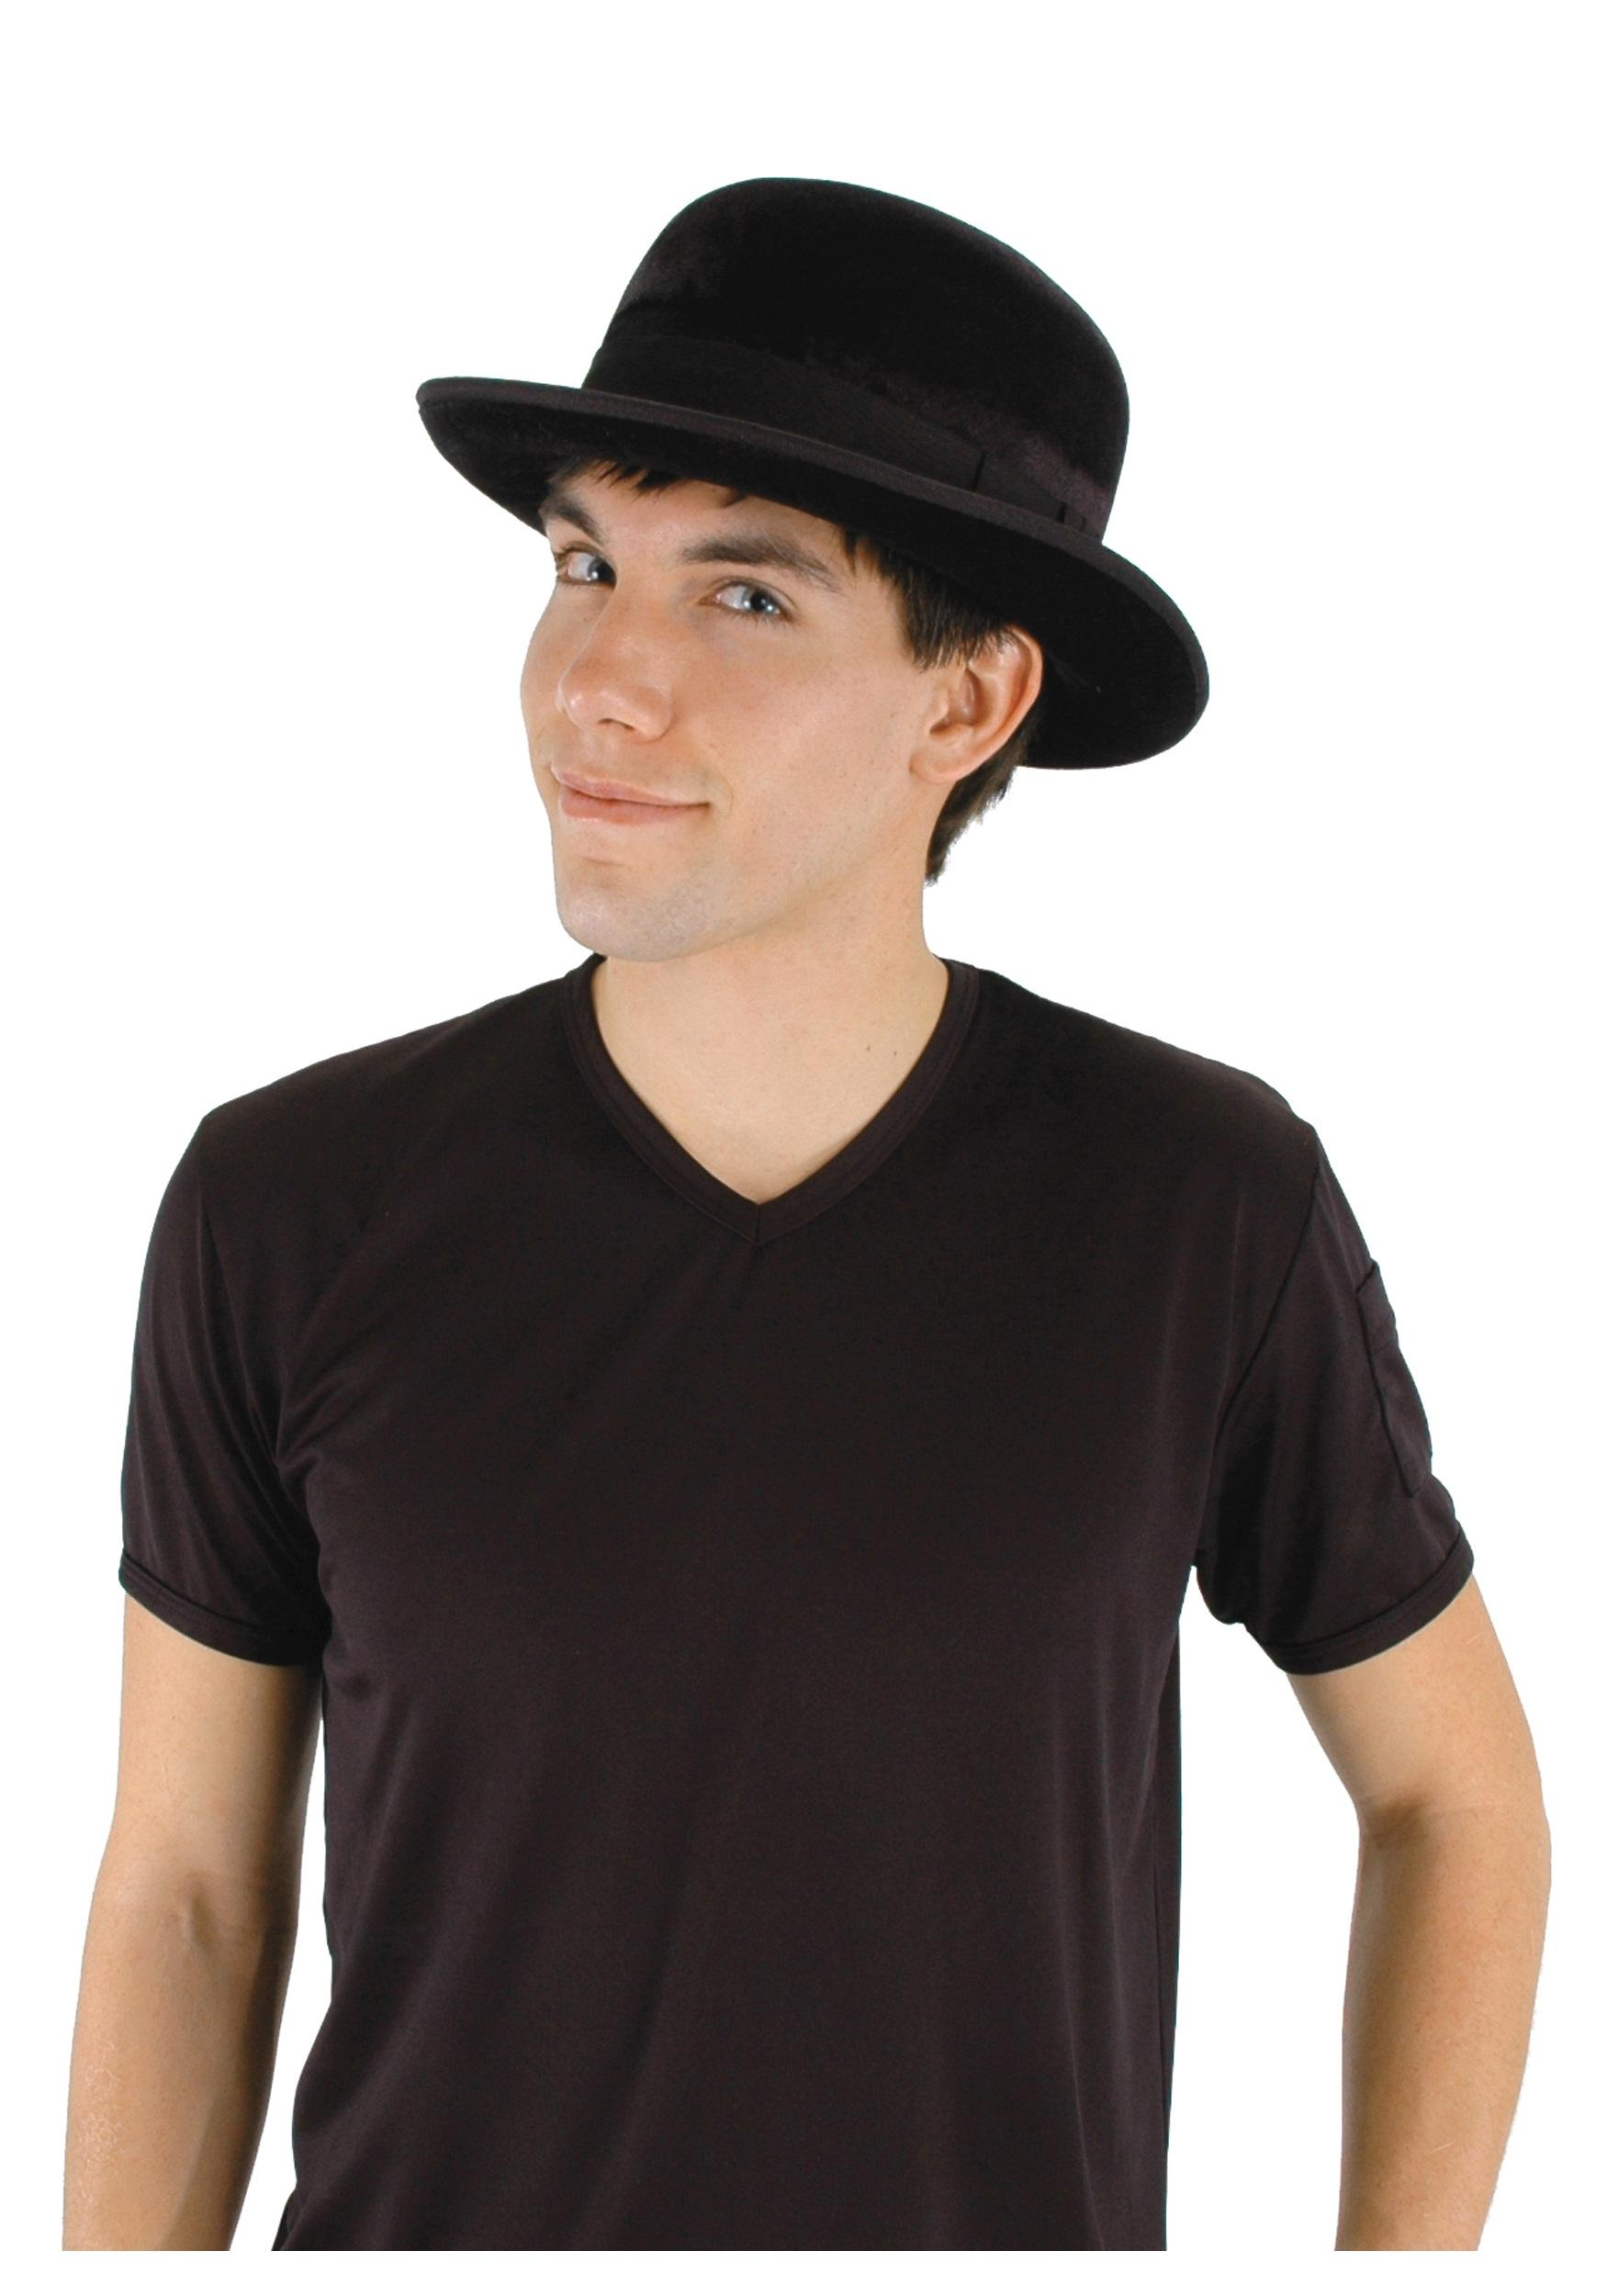 c5279f98147 Black Velour Bowler Hat